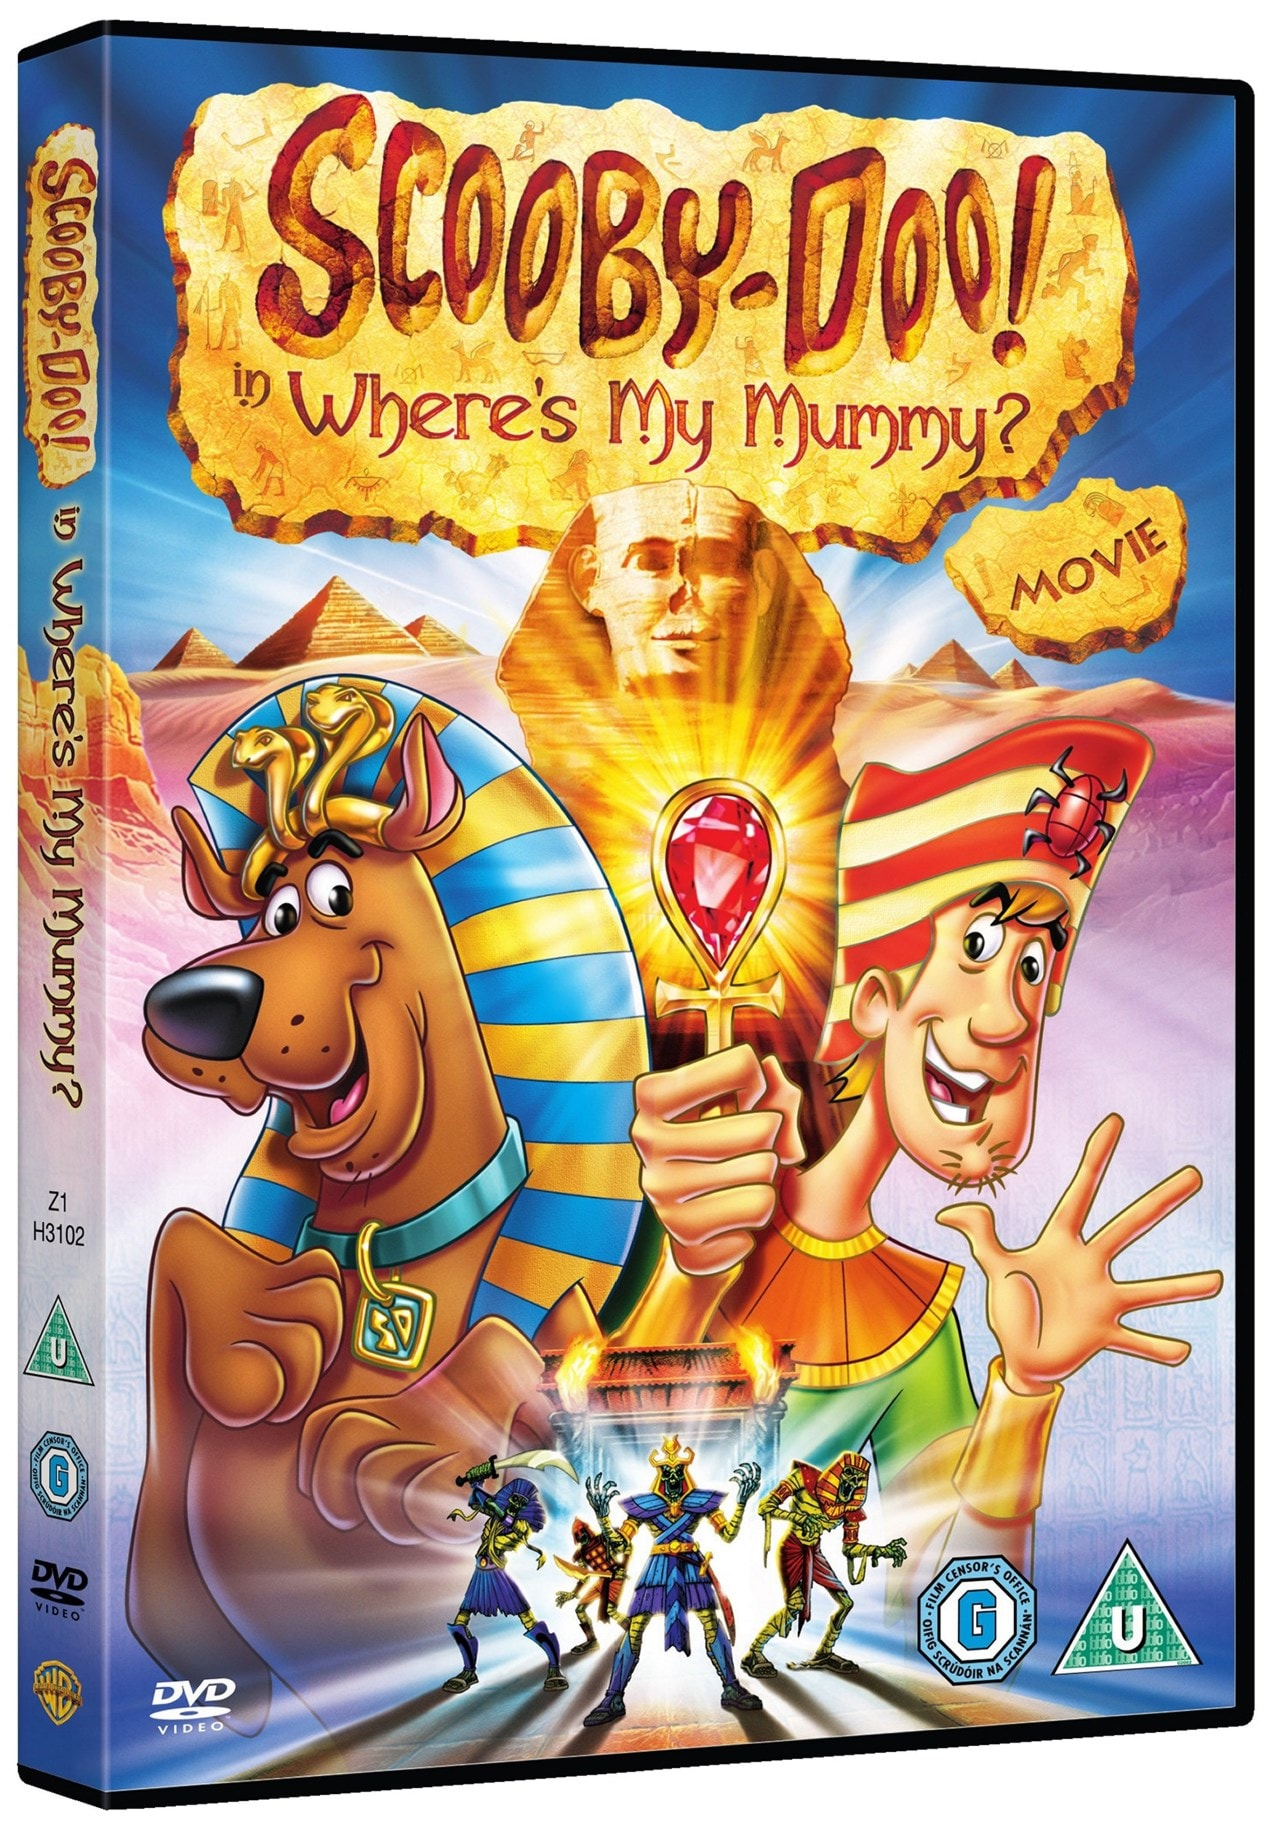 Scooby-Doo: Where's My Mummy? - 2